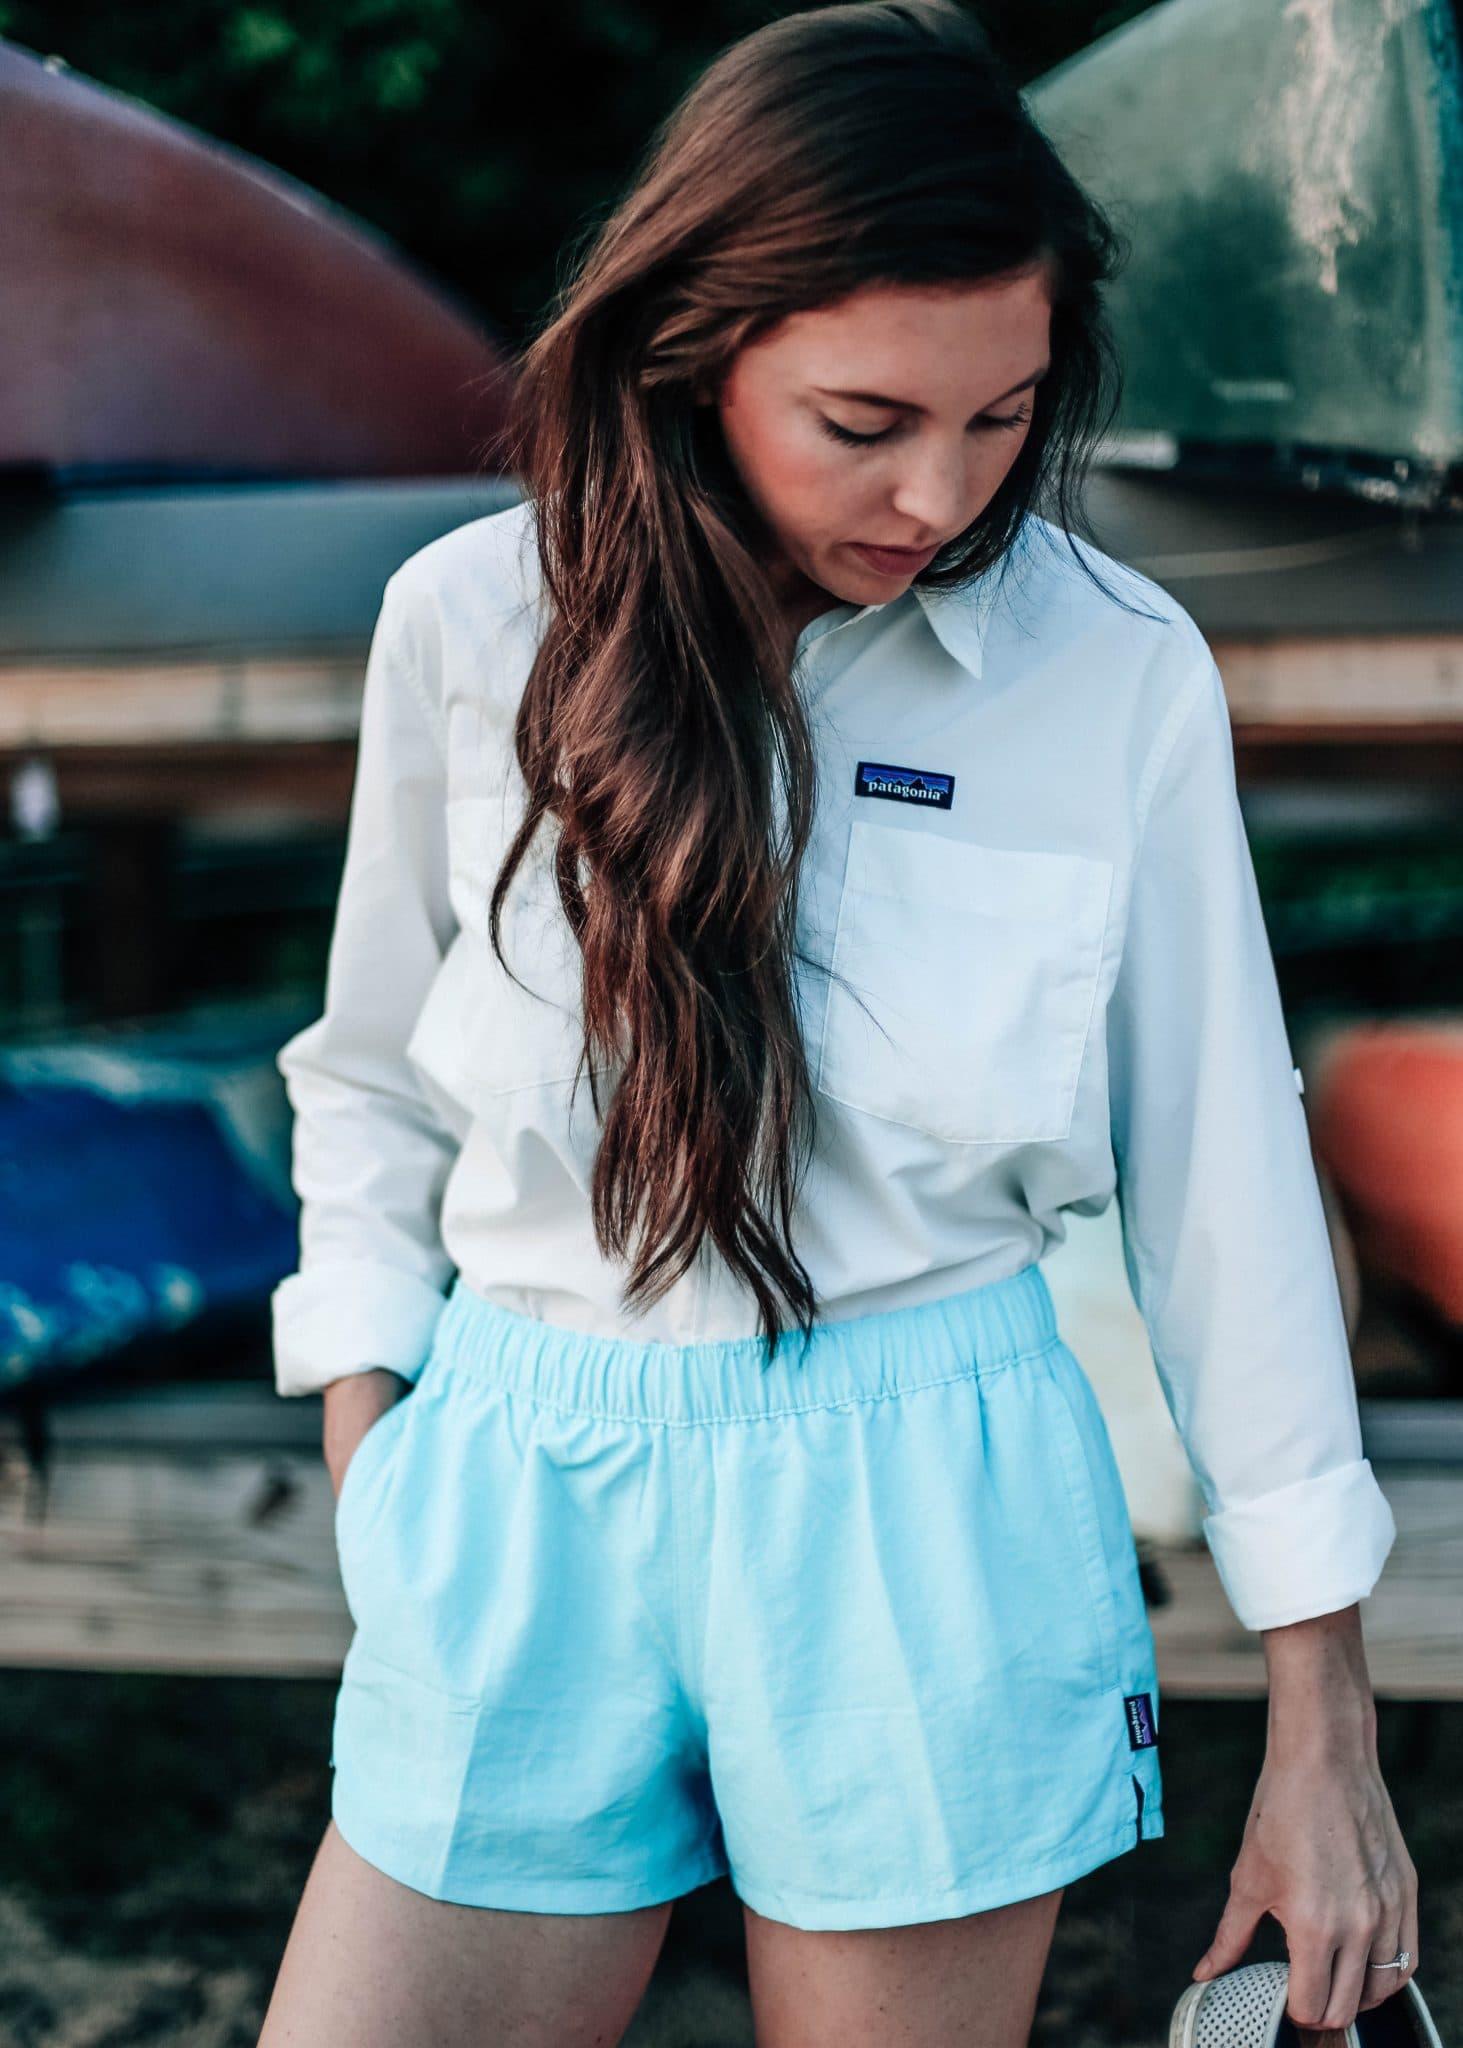 Patagonia Women's Barely Baggies Shorts, Anchor Bay Shirt, Lake Crabtree Raleigh